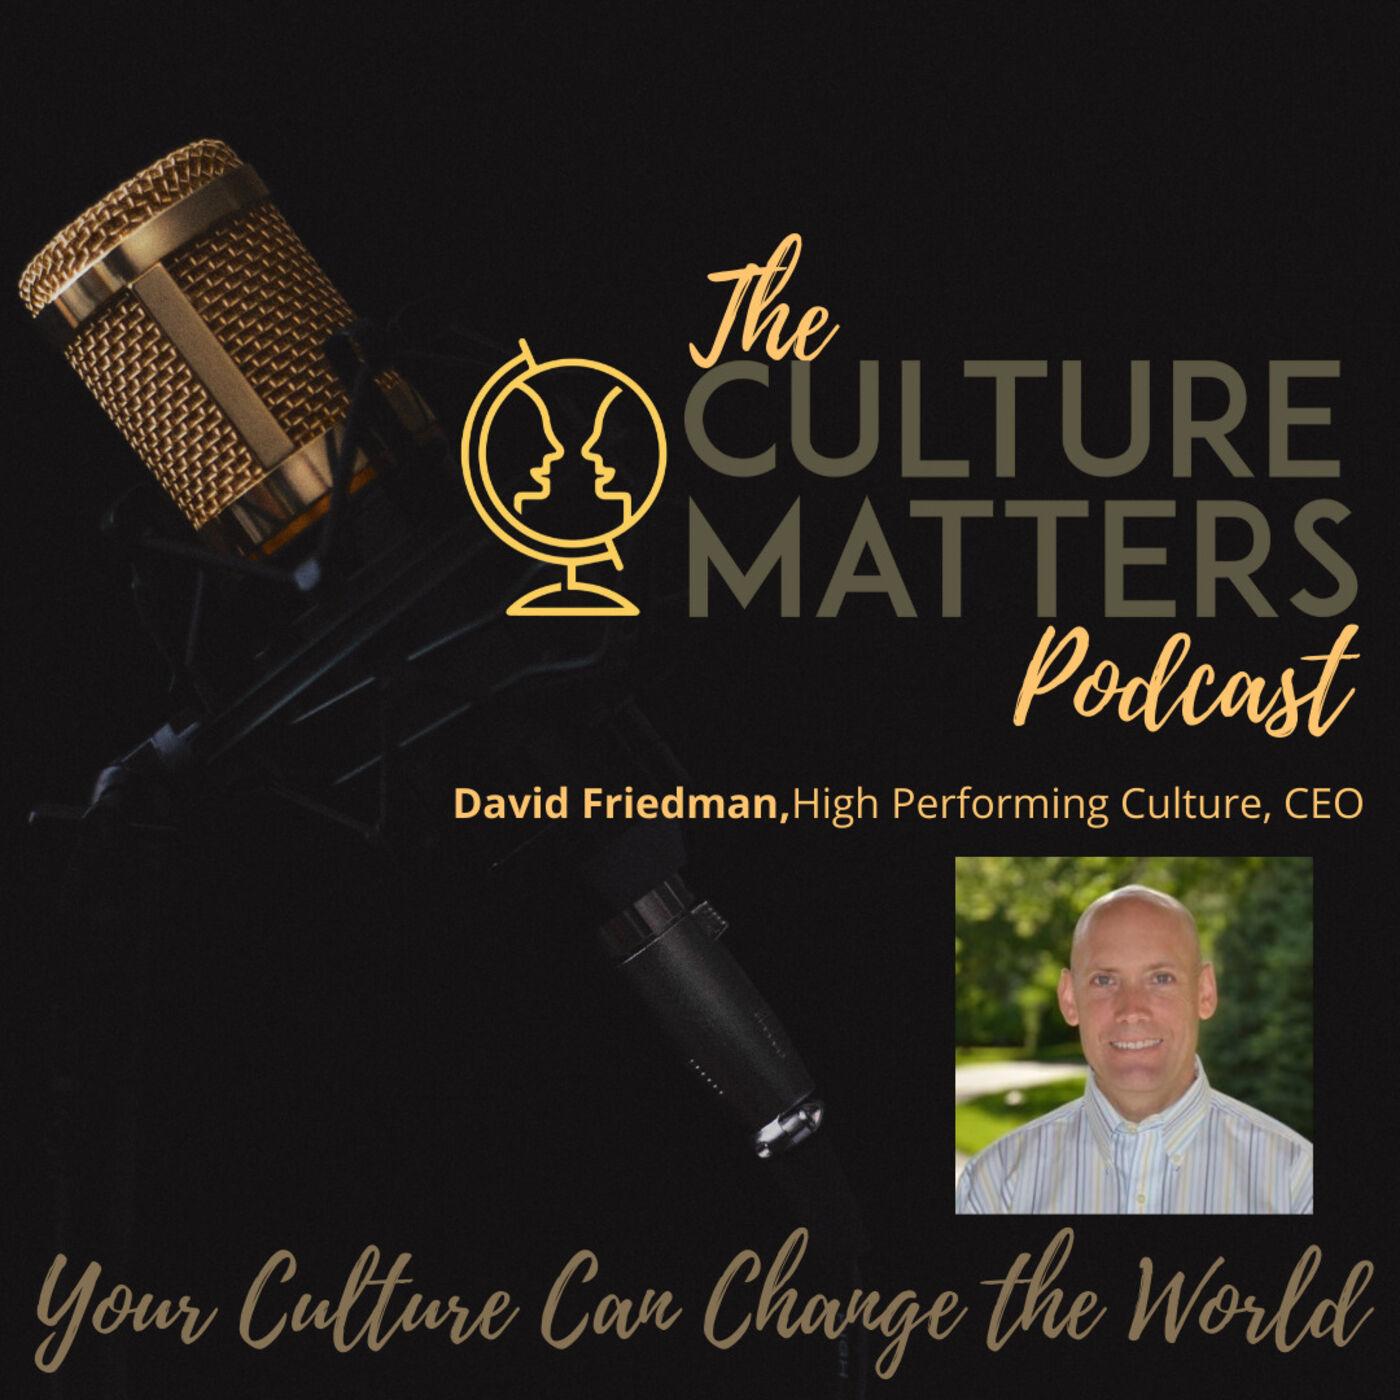 Season 6, Episode 72: Guest: David Friedman: Systematic Fundamentals